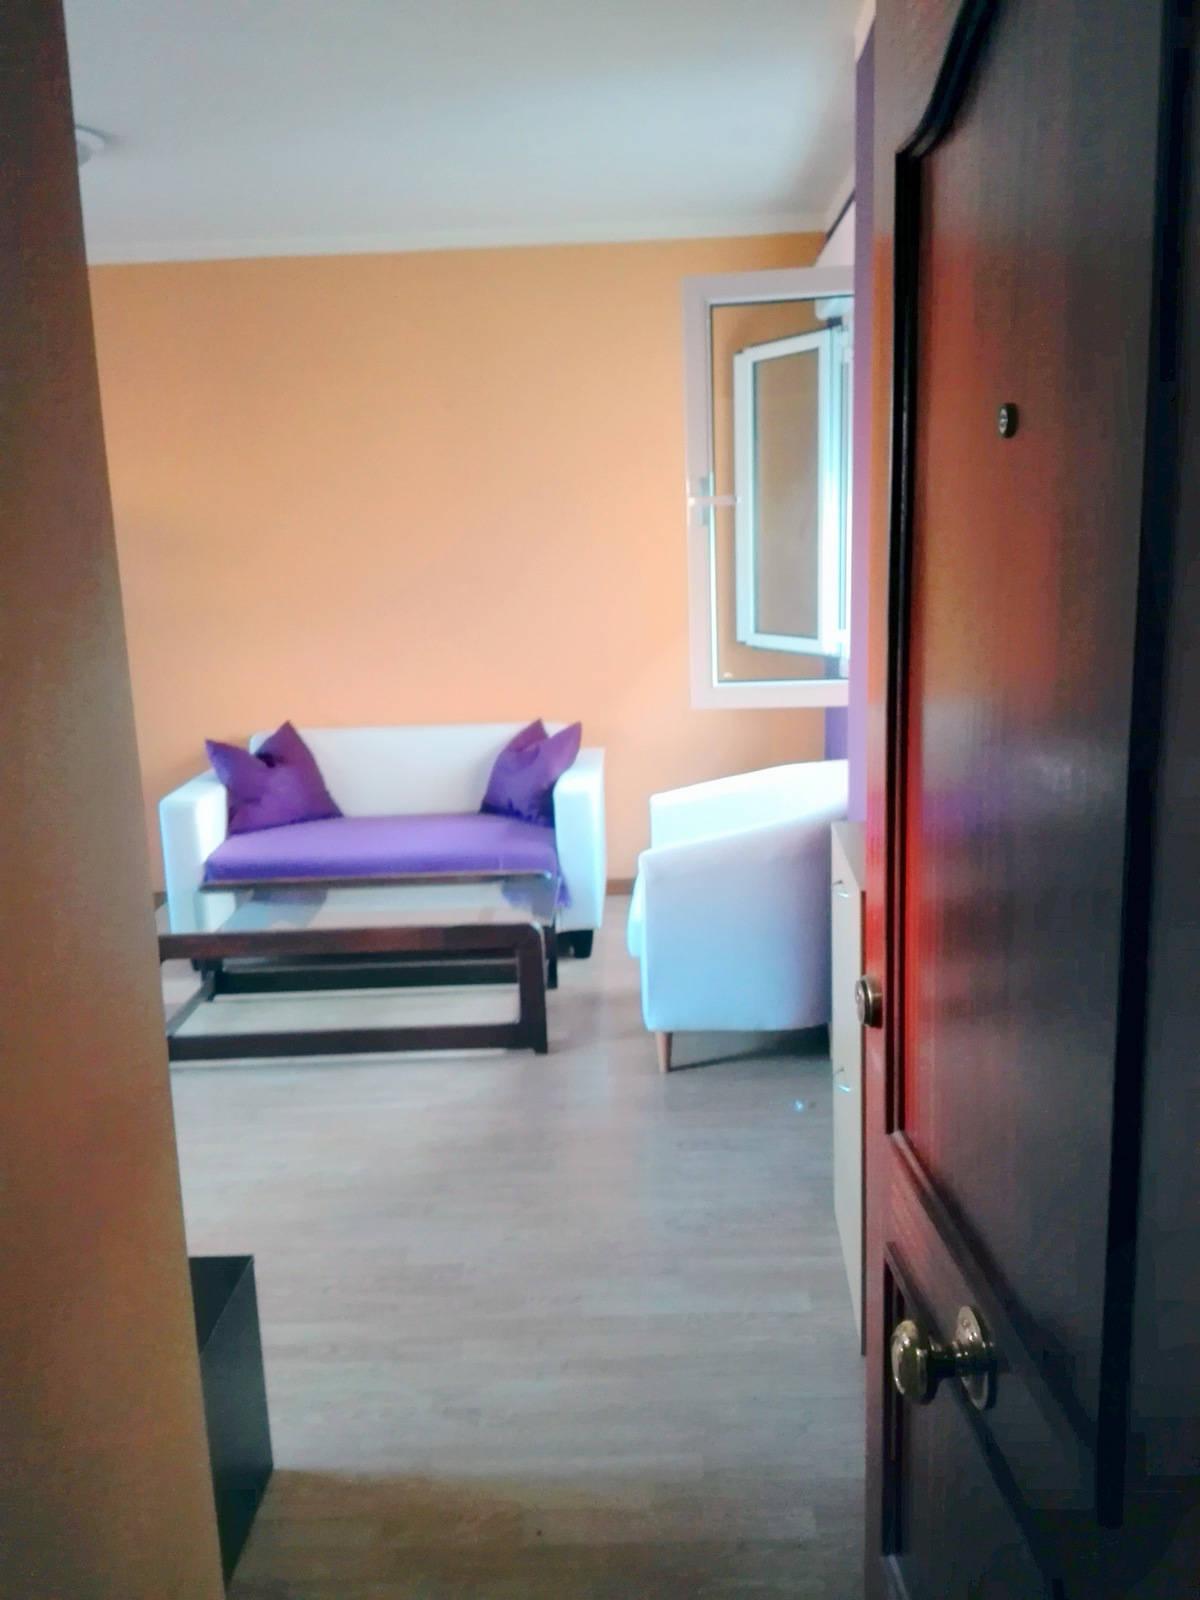 Se alquila  Vivienda con 1 dormitorio con todo incluidoVivienda  - Foto 17